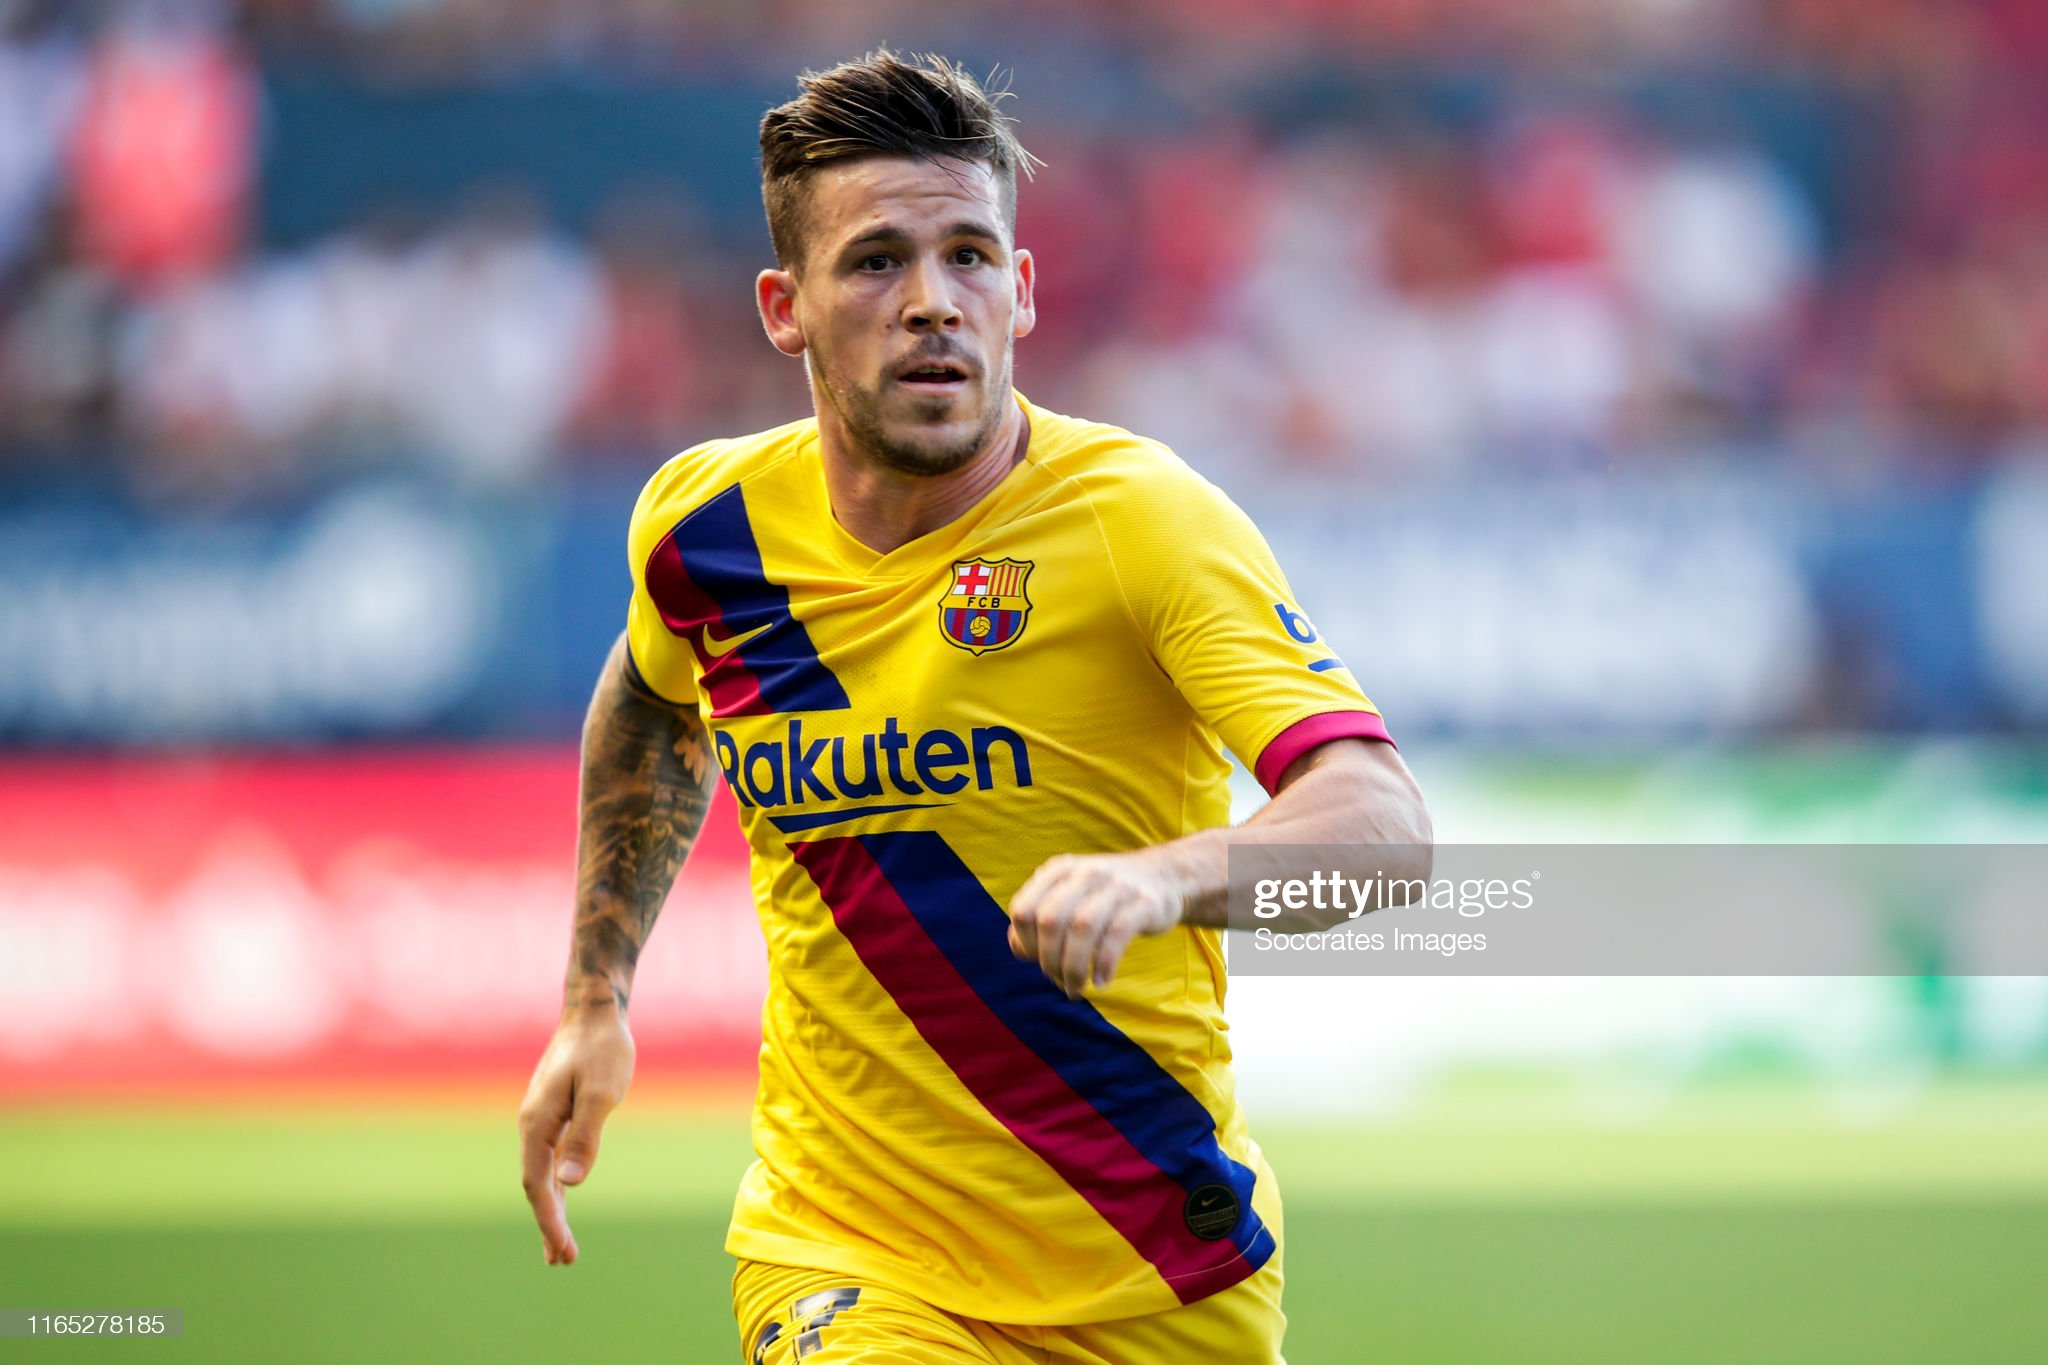 صور مباراة : أوساسونا - برشلونة 2-2 ( 31-08-2019 )  Carles-perez-of-fc-barcelona-during-the-la-liga-santander-match-v-picture-id1165278185?s=2048x2048